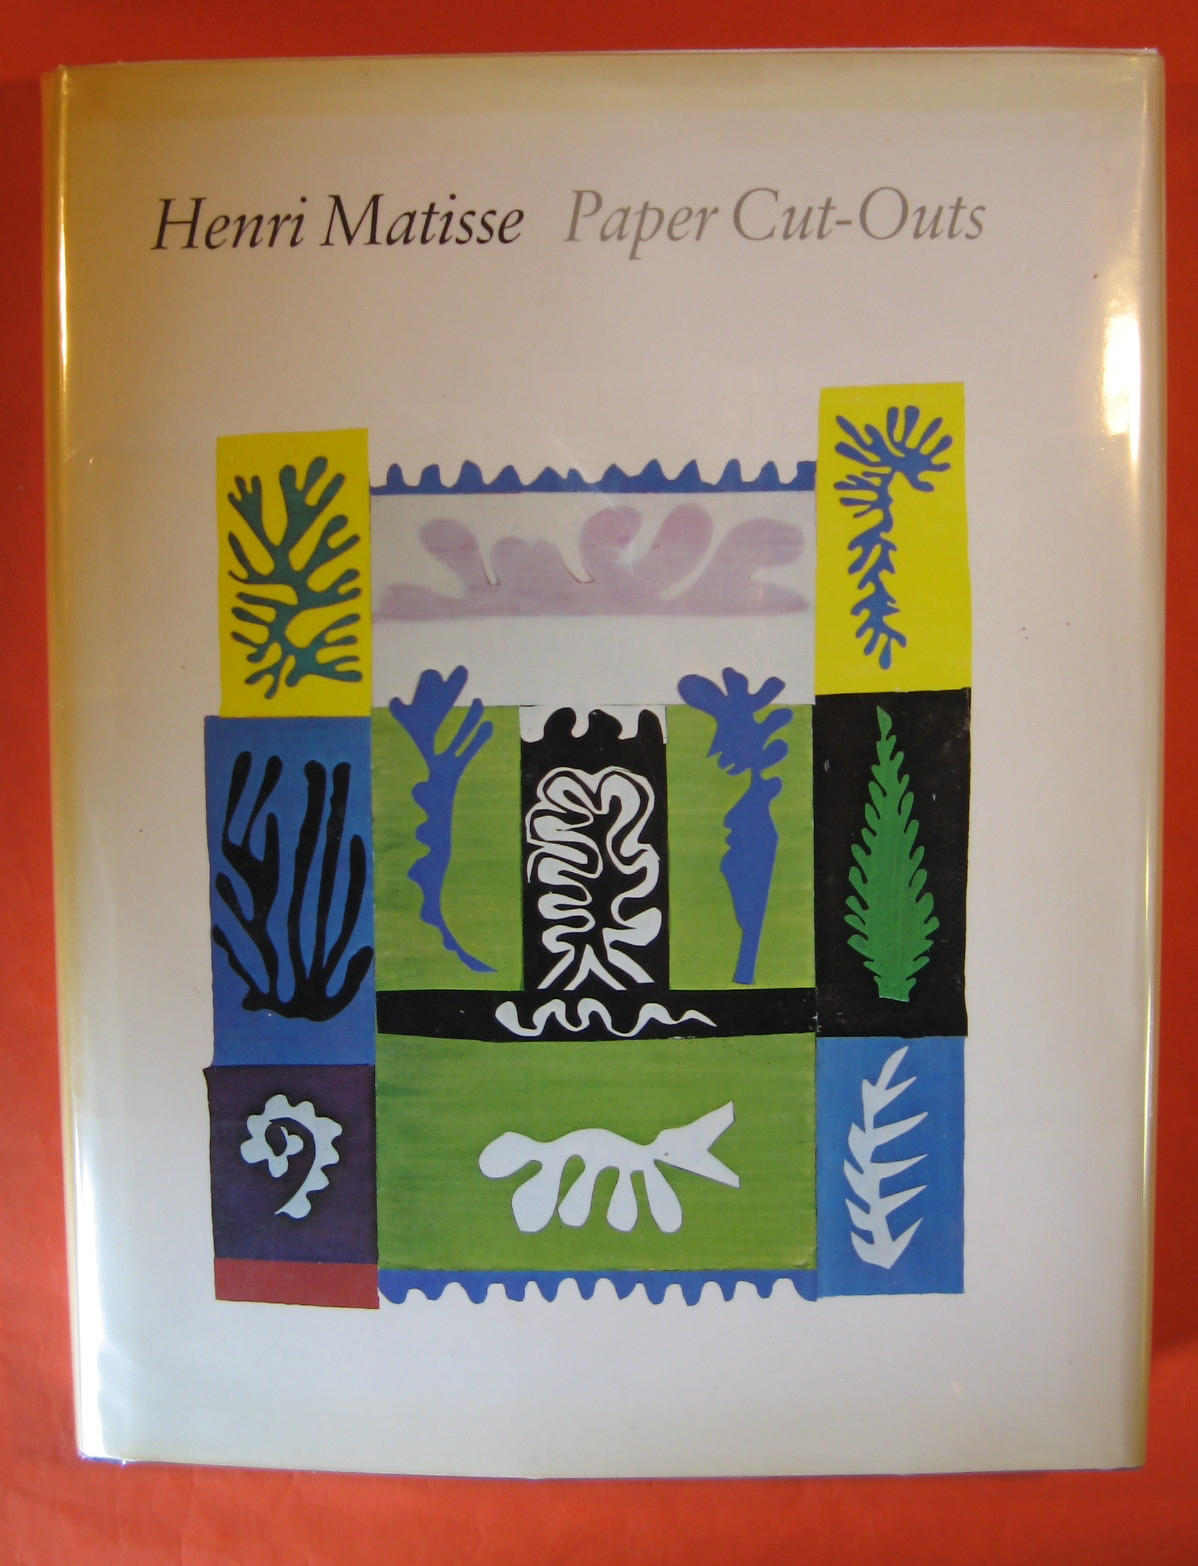 Henri Matisse : Paper Cut-Outs, Matisse, Henri; Jack Cowart; Jack D. Flam; Dominique Fourcade; John Hallmark Neff; John Haletsky; Antoinette King